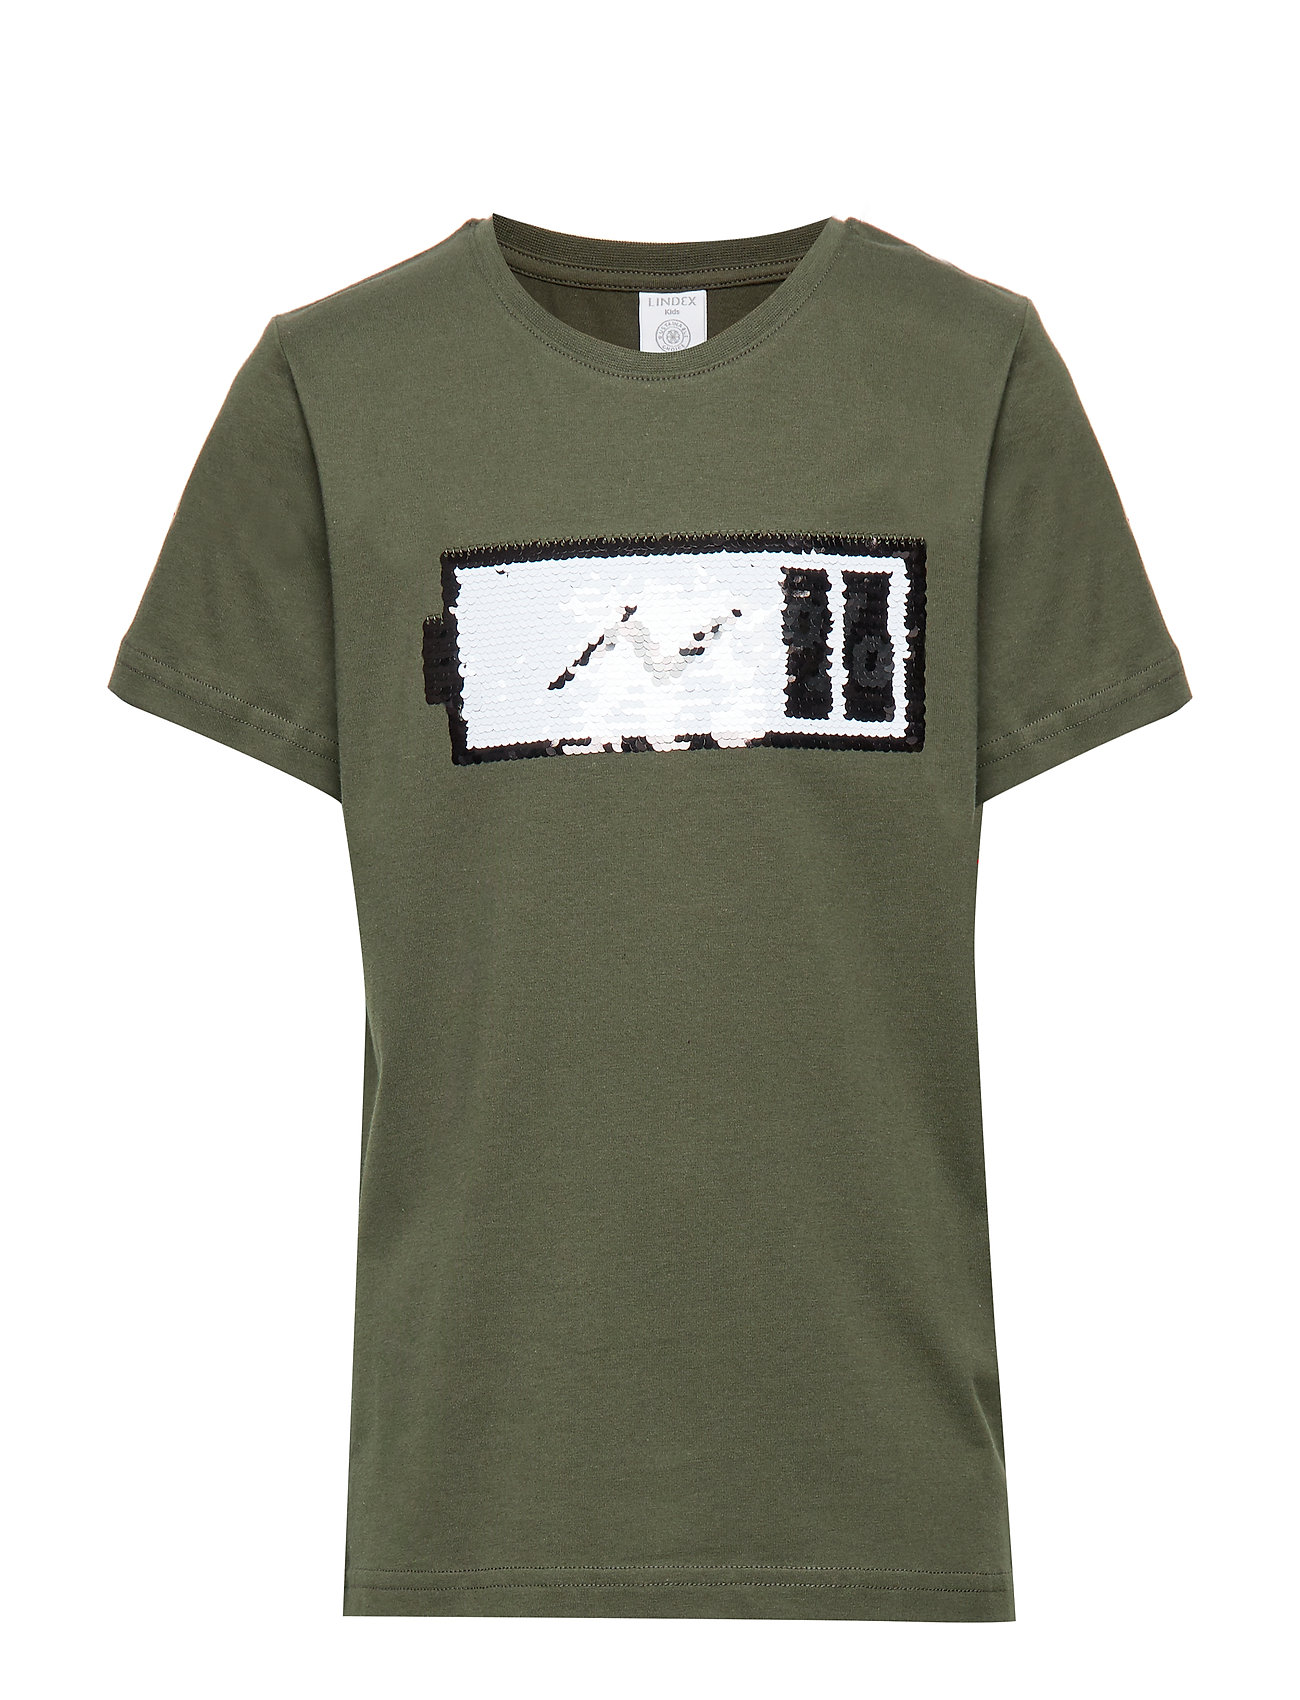 Lindex Green t-shirt with reversible sequins - DK KHAKI GREEN